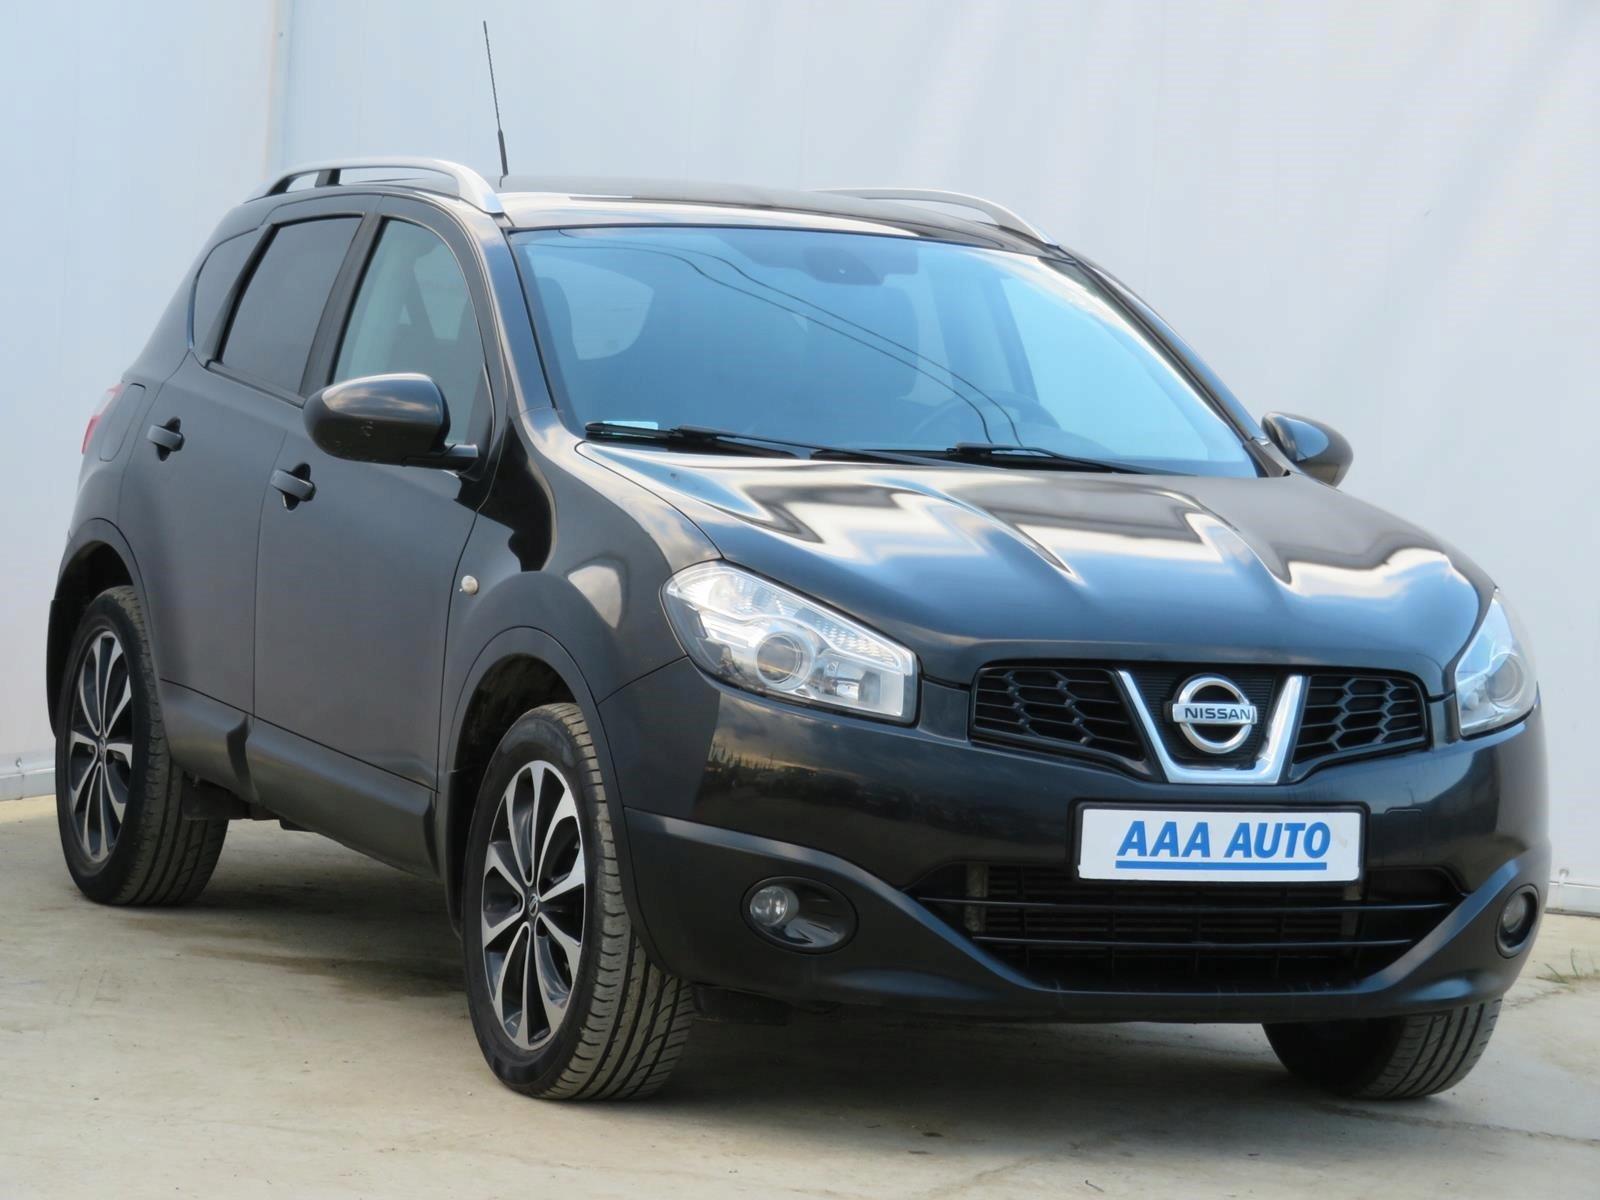 Nissan Qashqai 2.0 dCi , Salon Polska, Serwis ASO